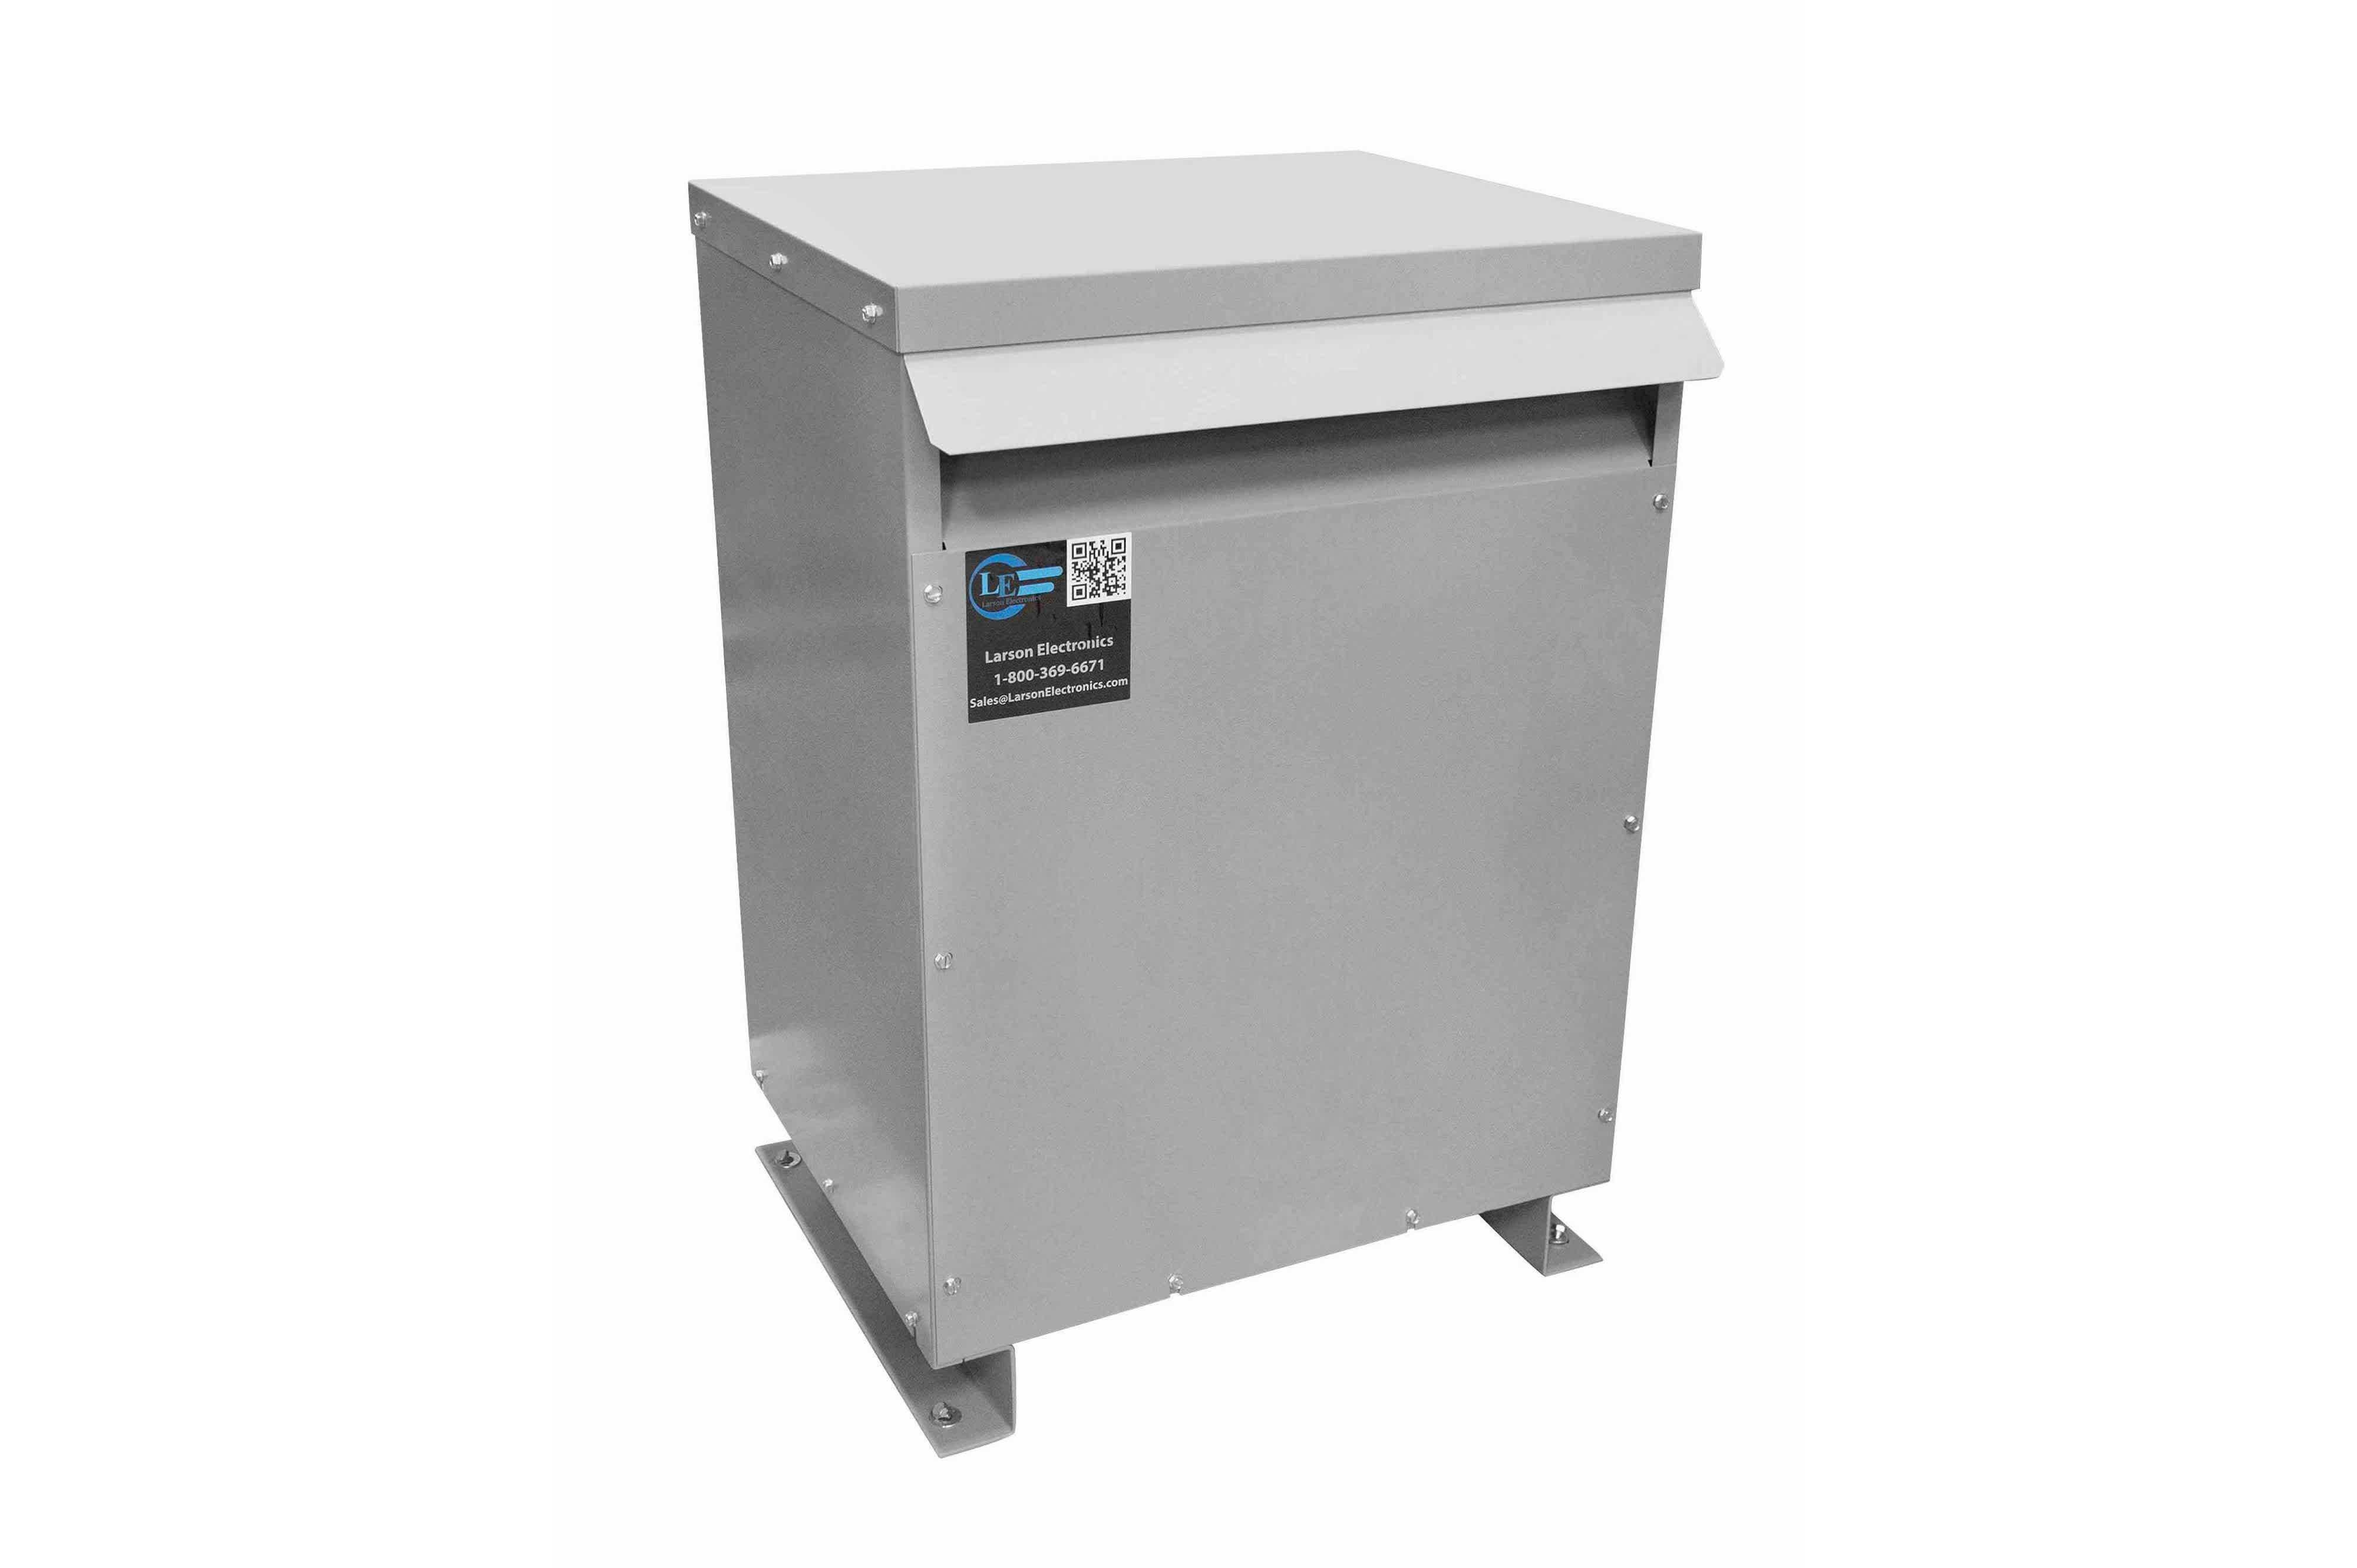 137.5 kVA 3PH Isolation Transformer, 460V Wye Primary, 240V Delta Secondary, N3R, Ventilated, 60 Hz